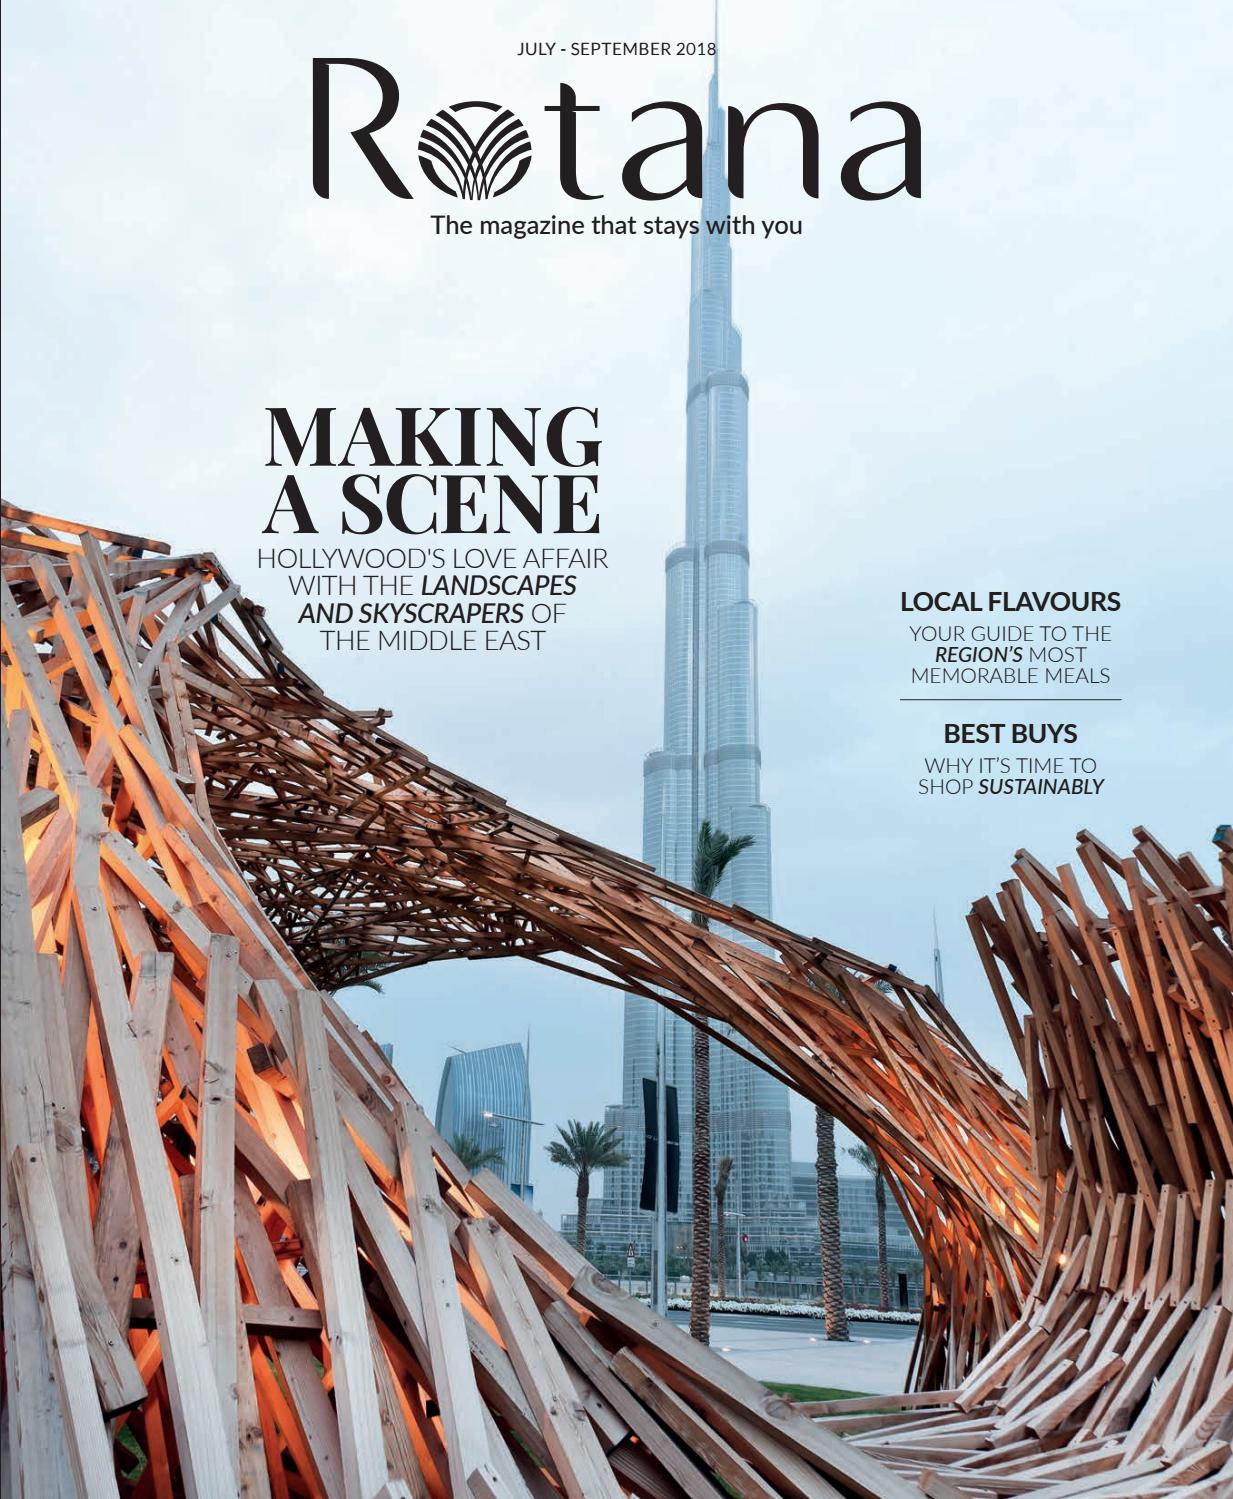 12cd0c261 Rotana July-September 2018 by Rotana Magazine - issuu